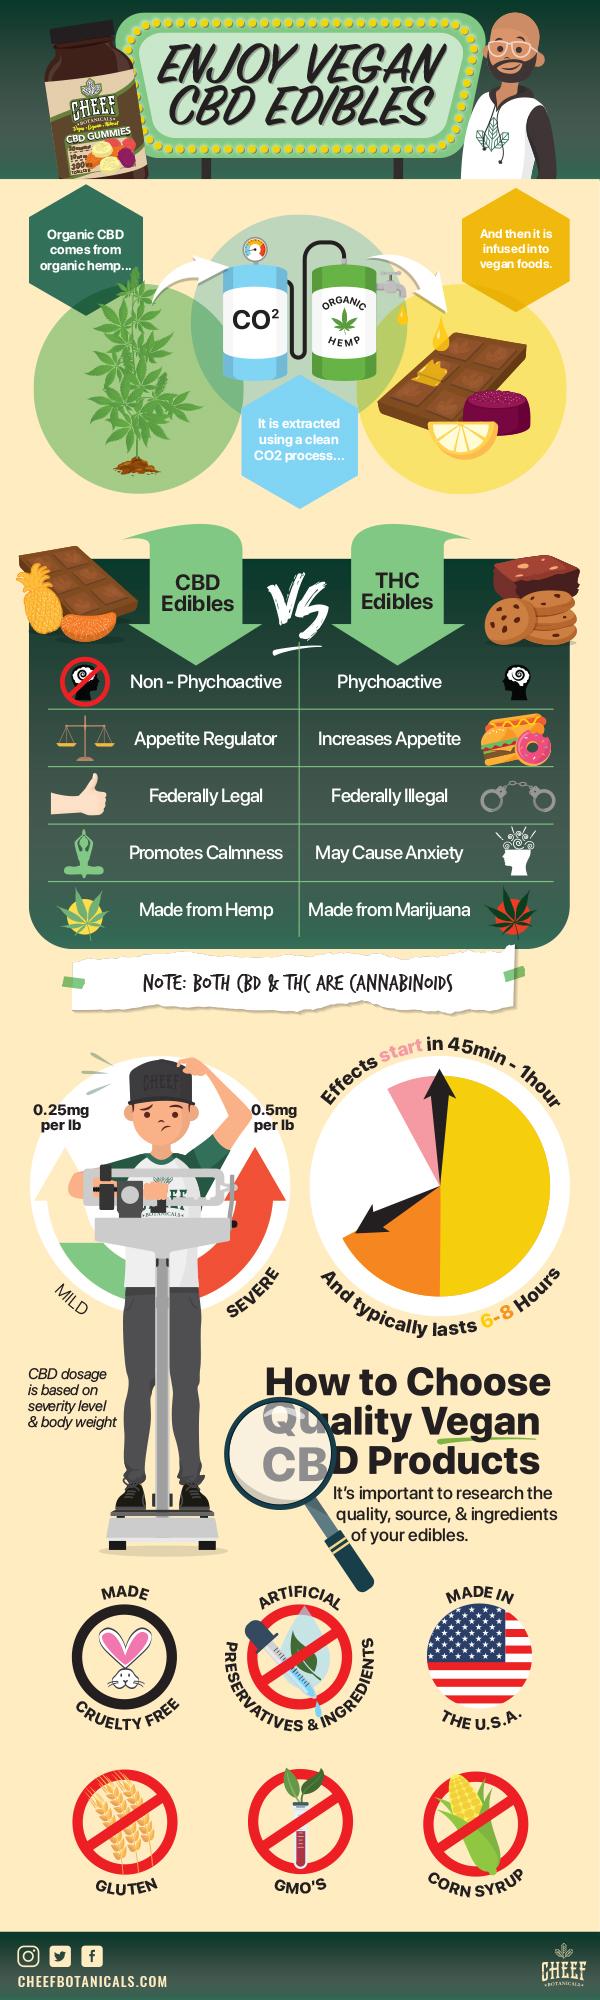 Enjoy Vegan CBD Edibles #infographic